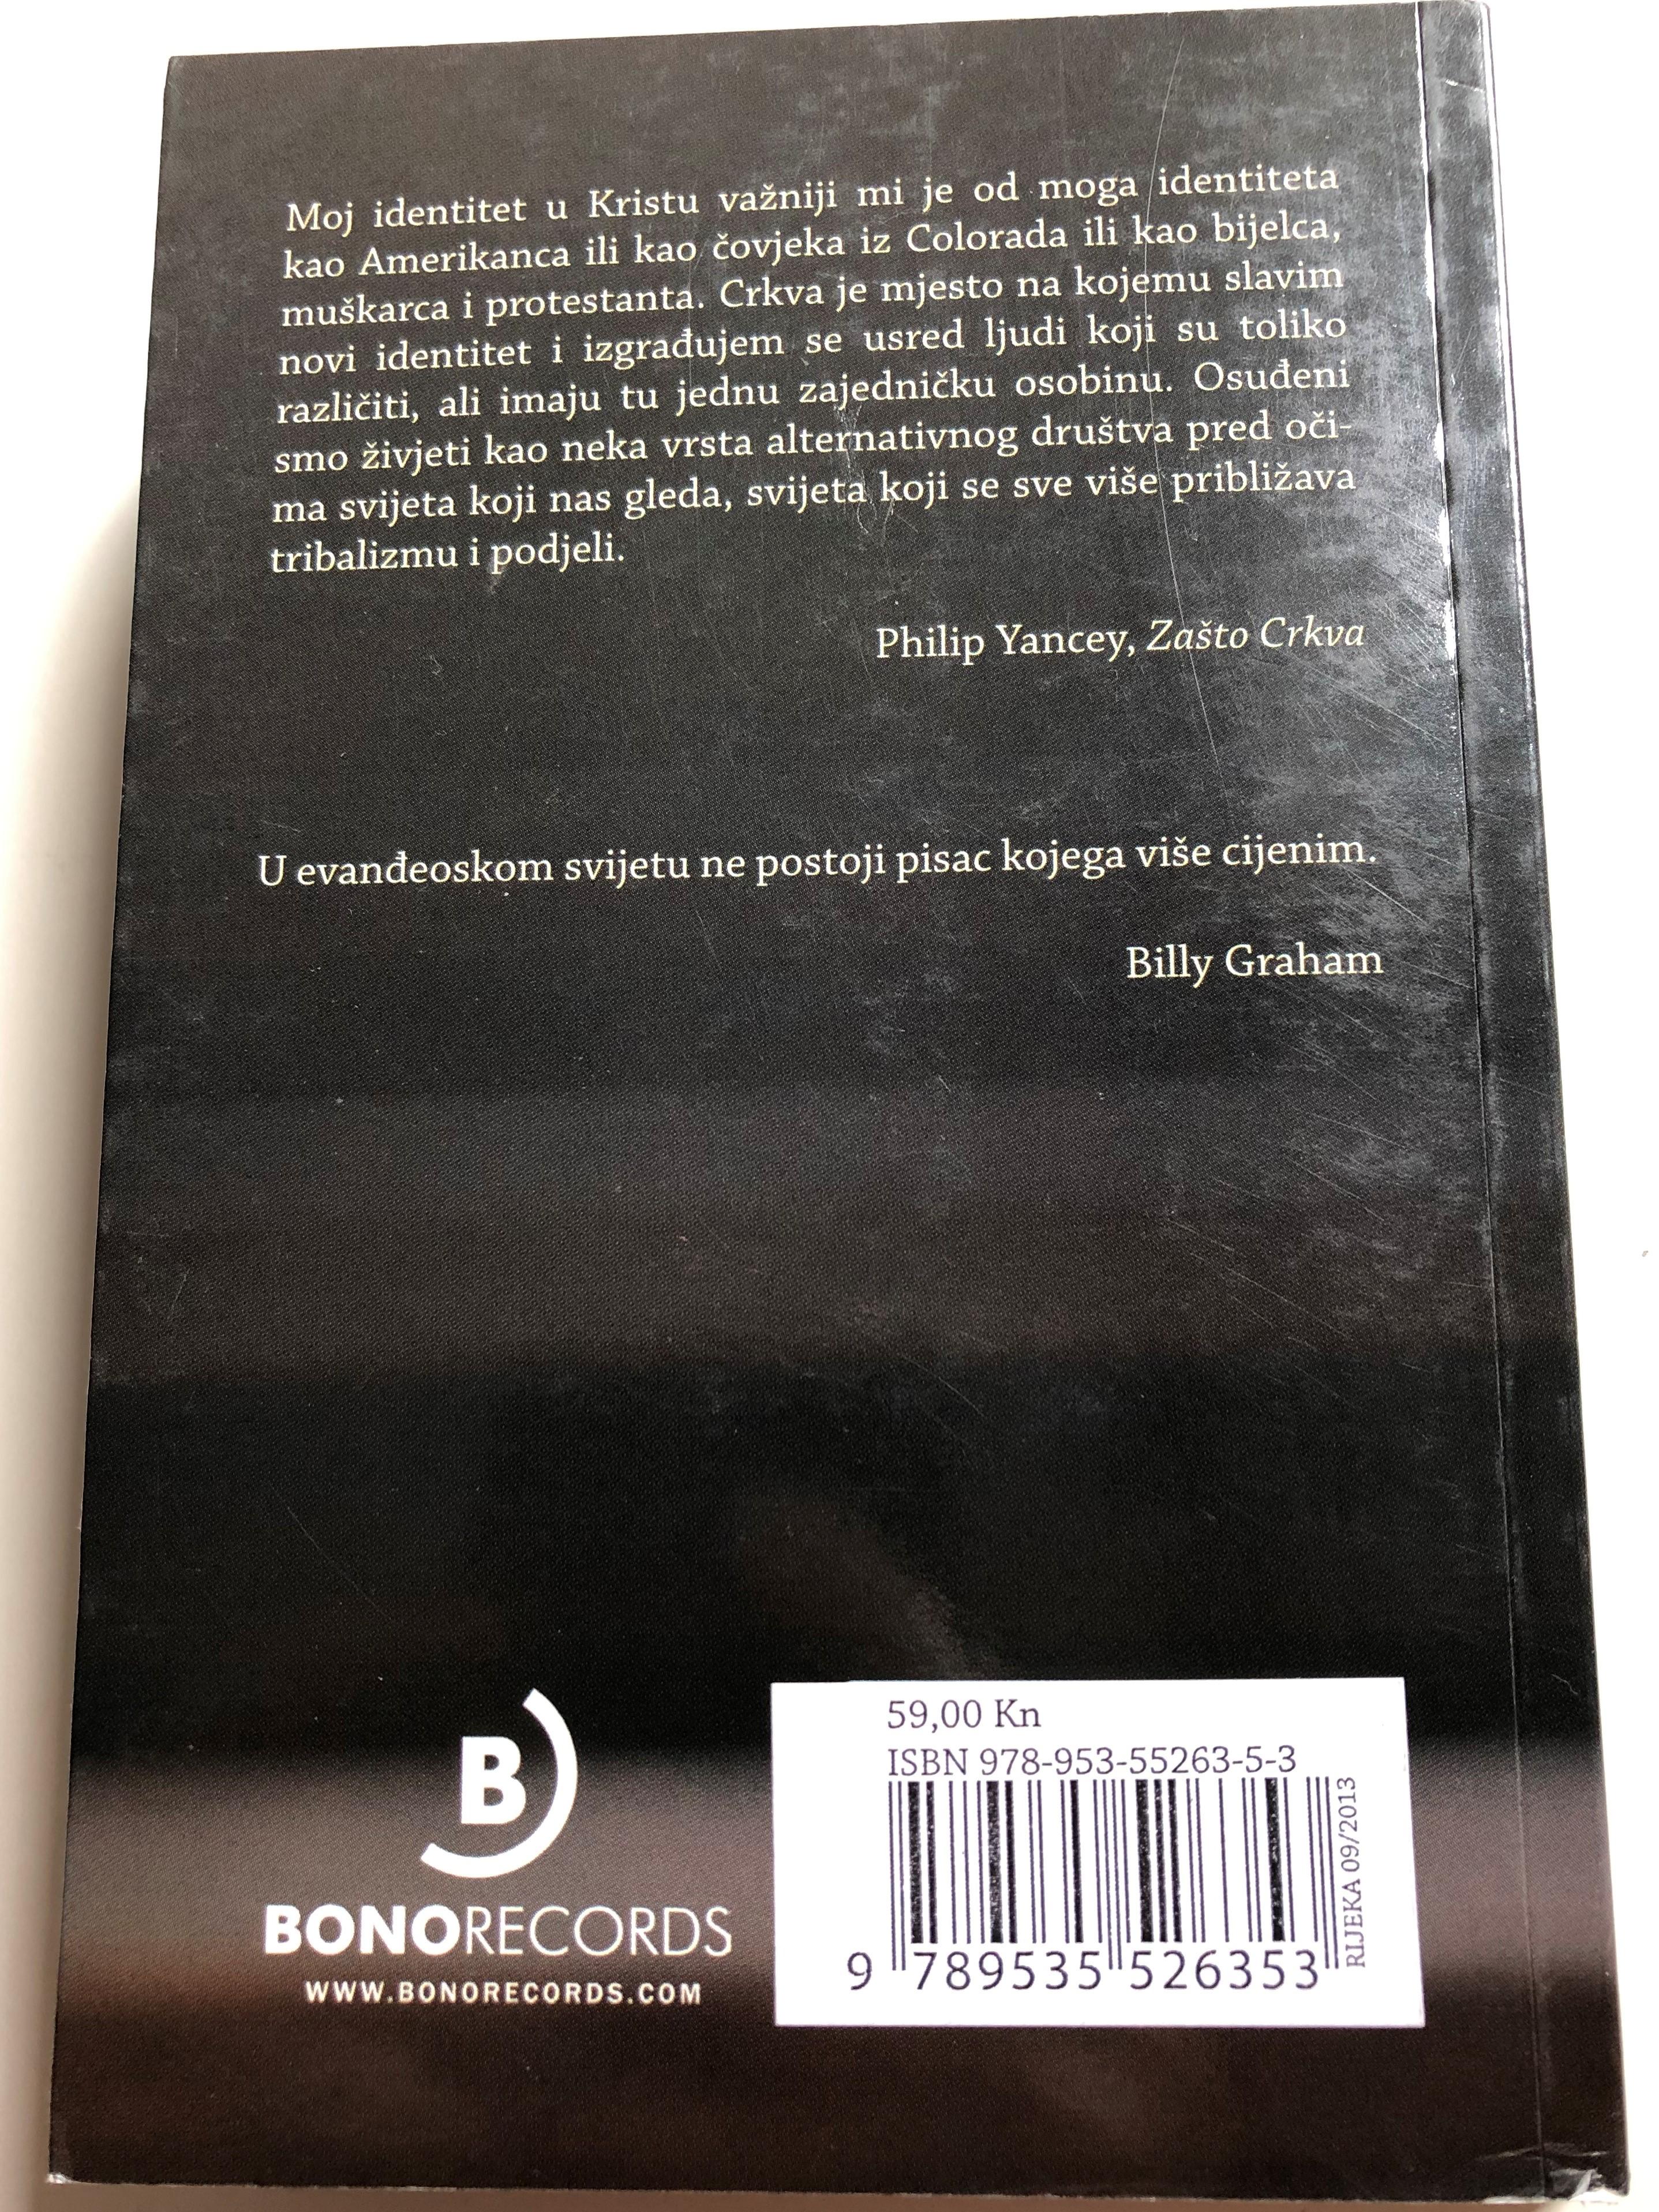 za-to-crkva-moje-osobno-hodo-a-e-by-philip-yancey-croatian-translation-of-church-why-bother-8.jpg